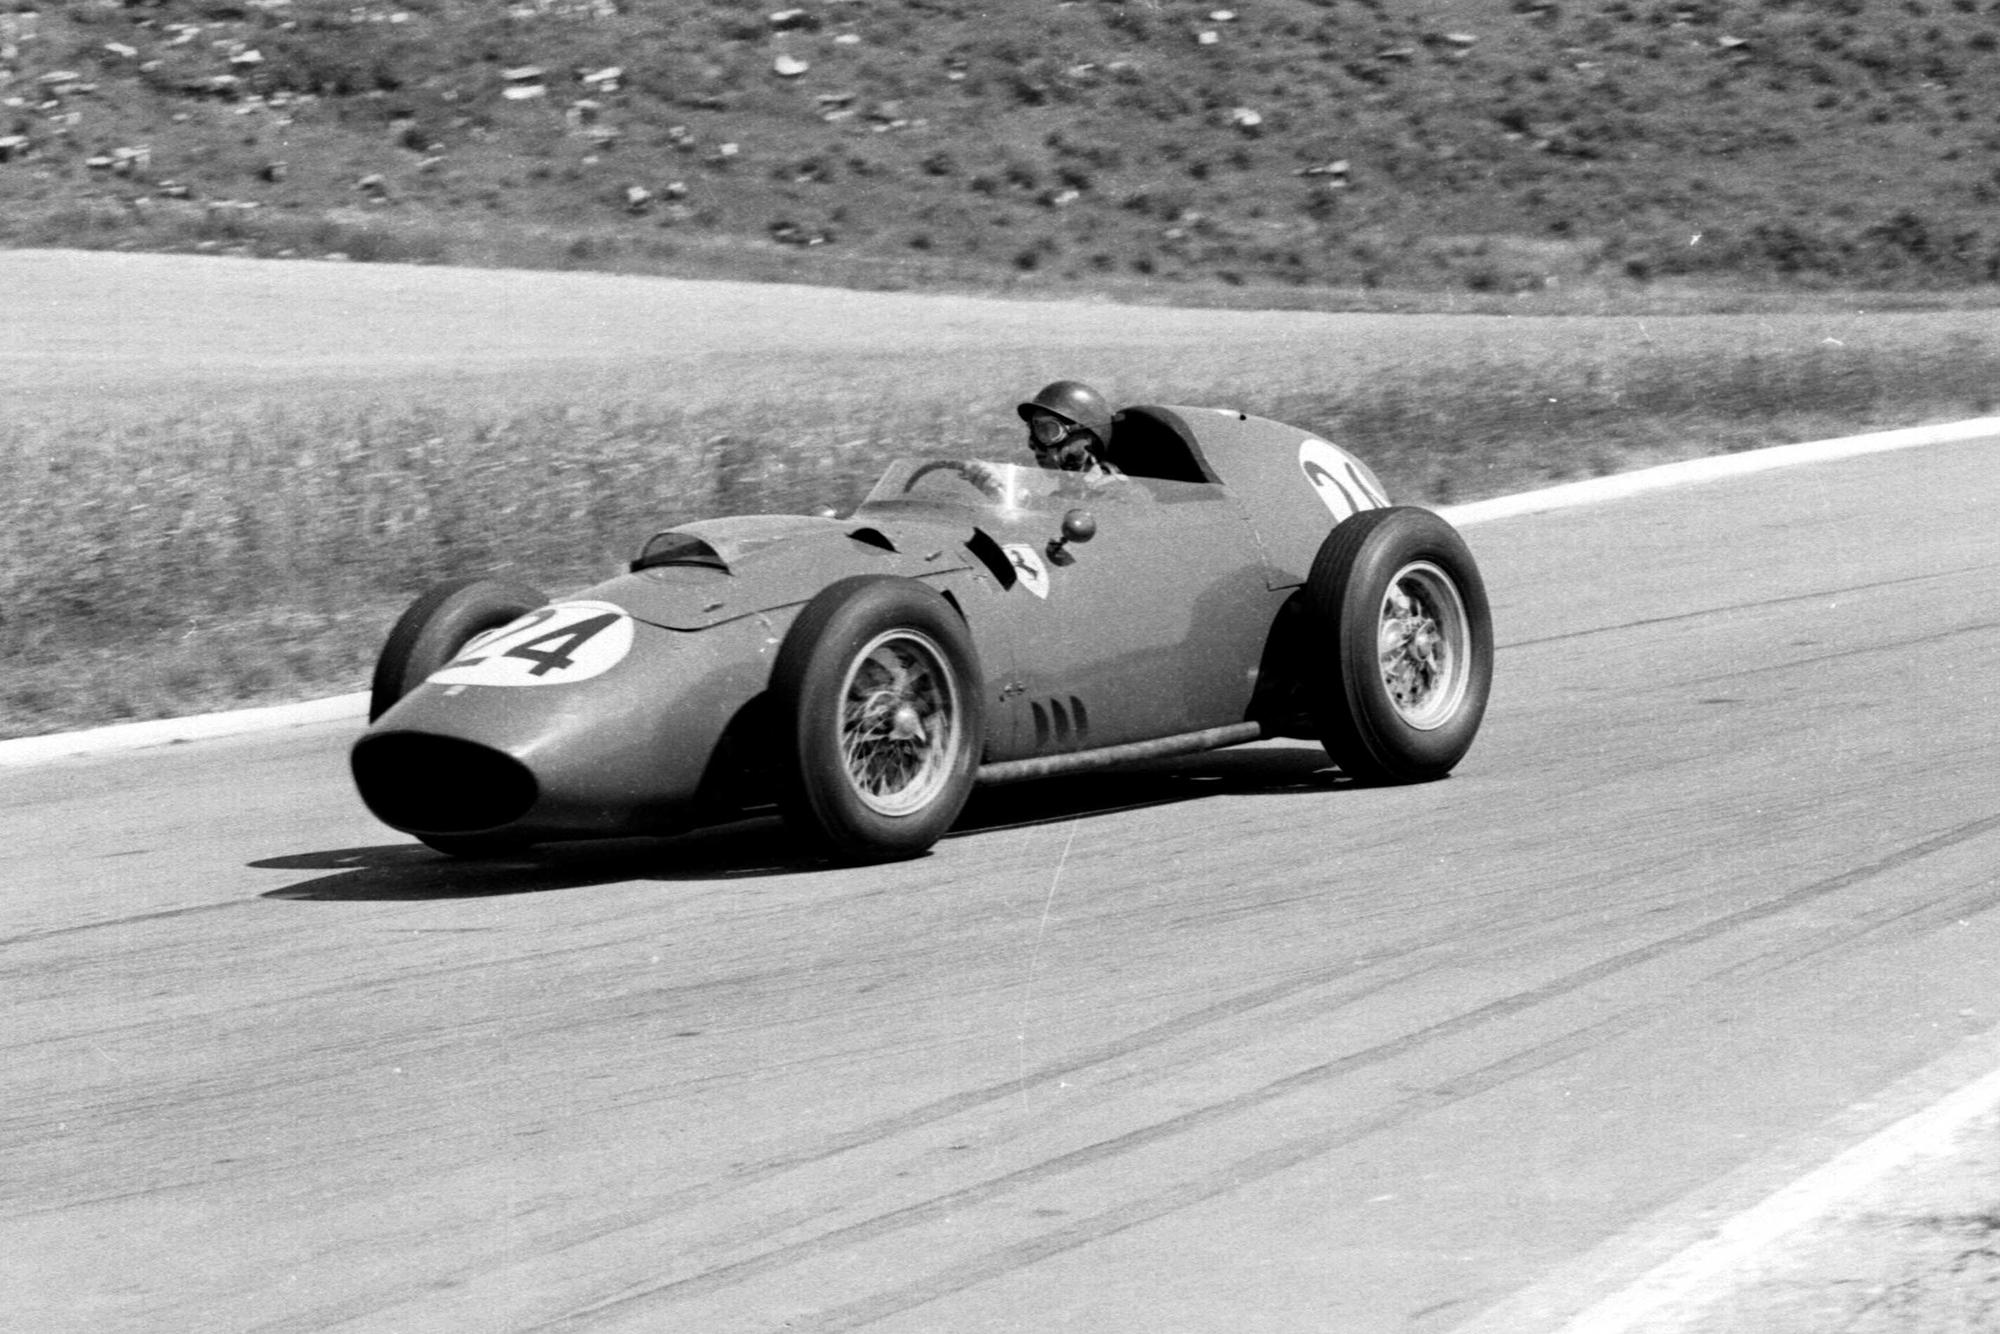 Tony Brooks in his Ferrari Dino 246.